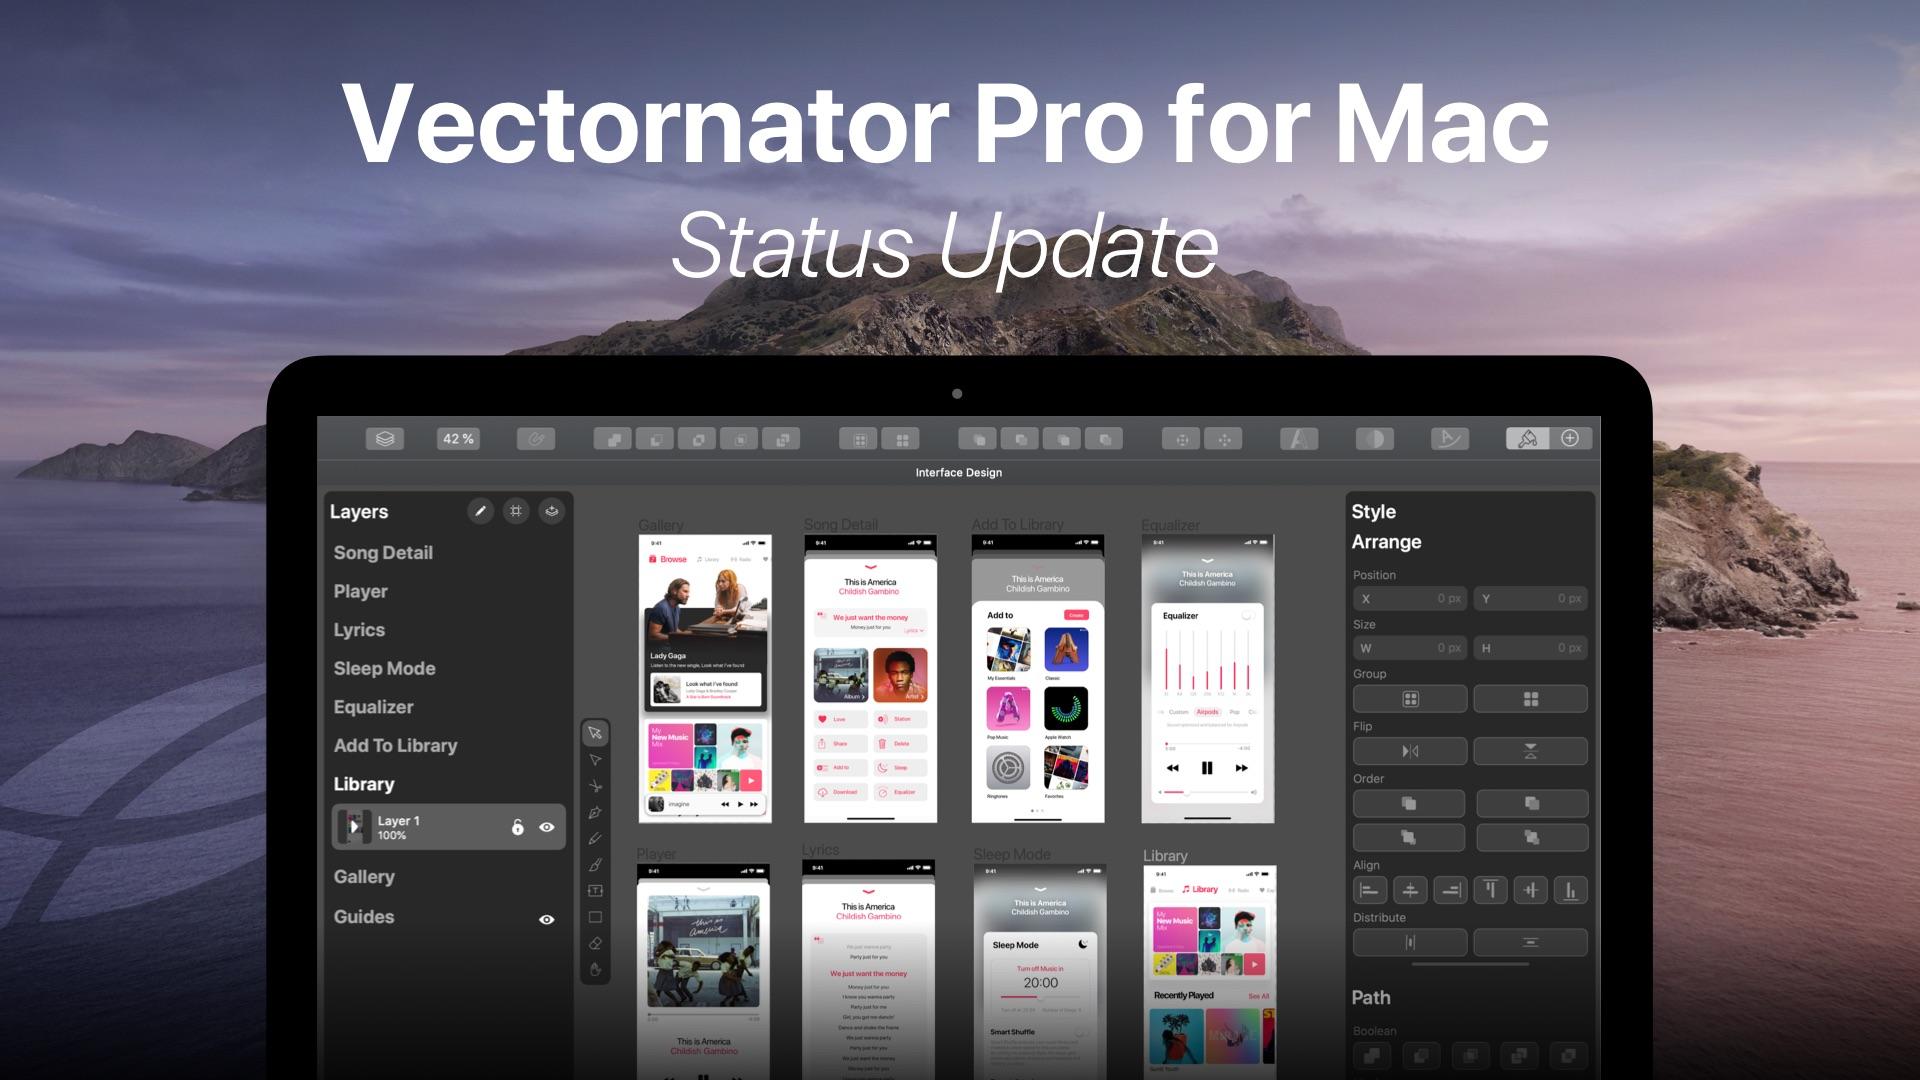 Vectornator Pro for Mac status update